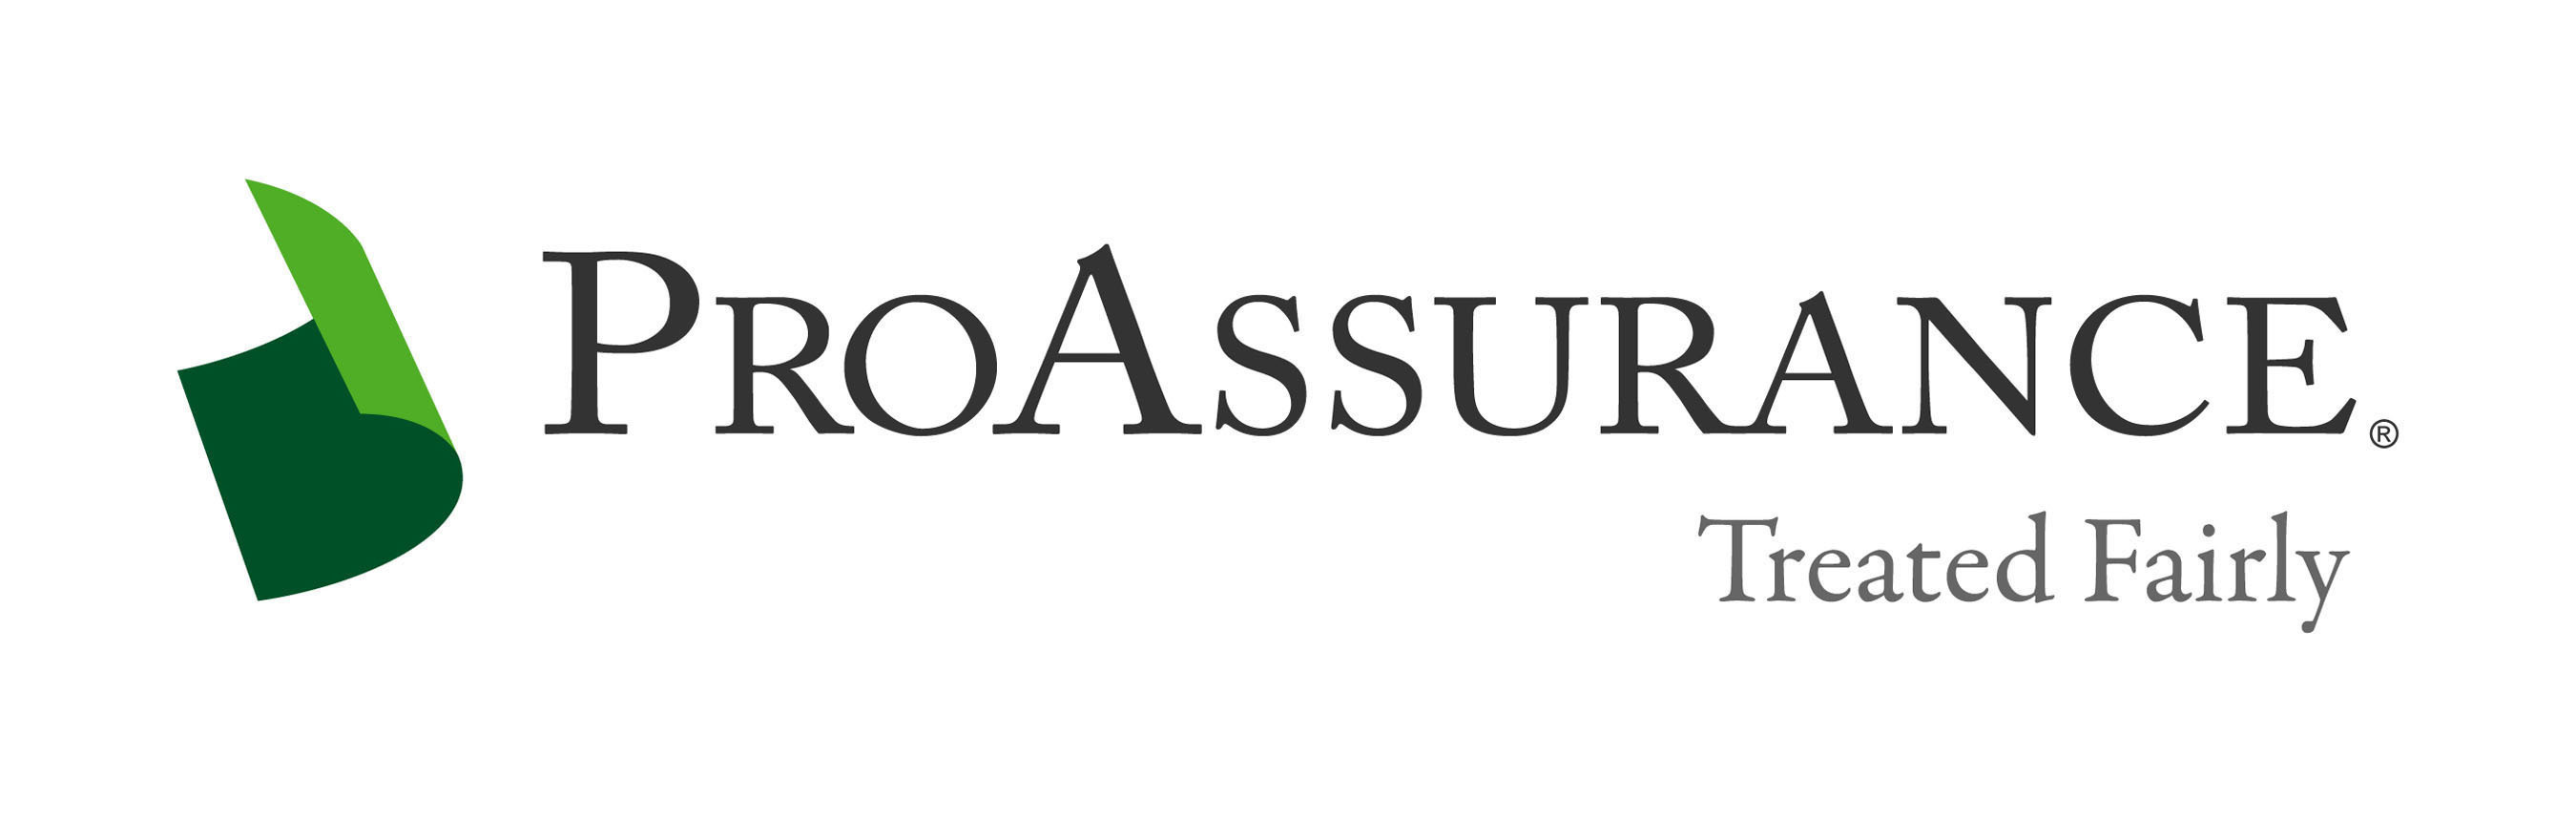 Corporate Logo. (PRNewsFoto/ProAssurance) (PRNewsFoto/) (PRNewsFoto/)